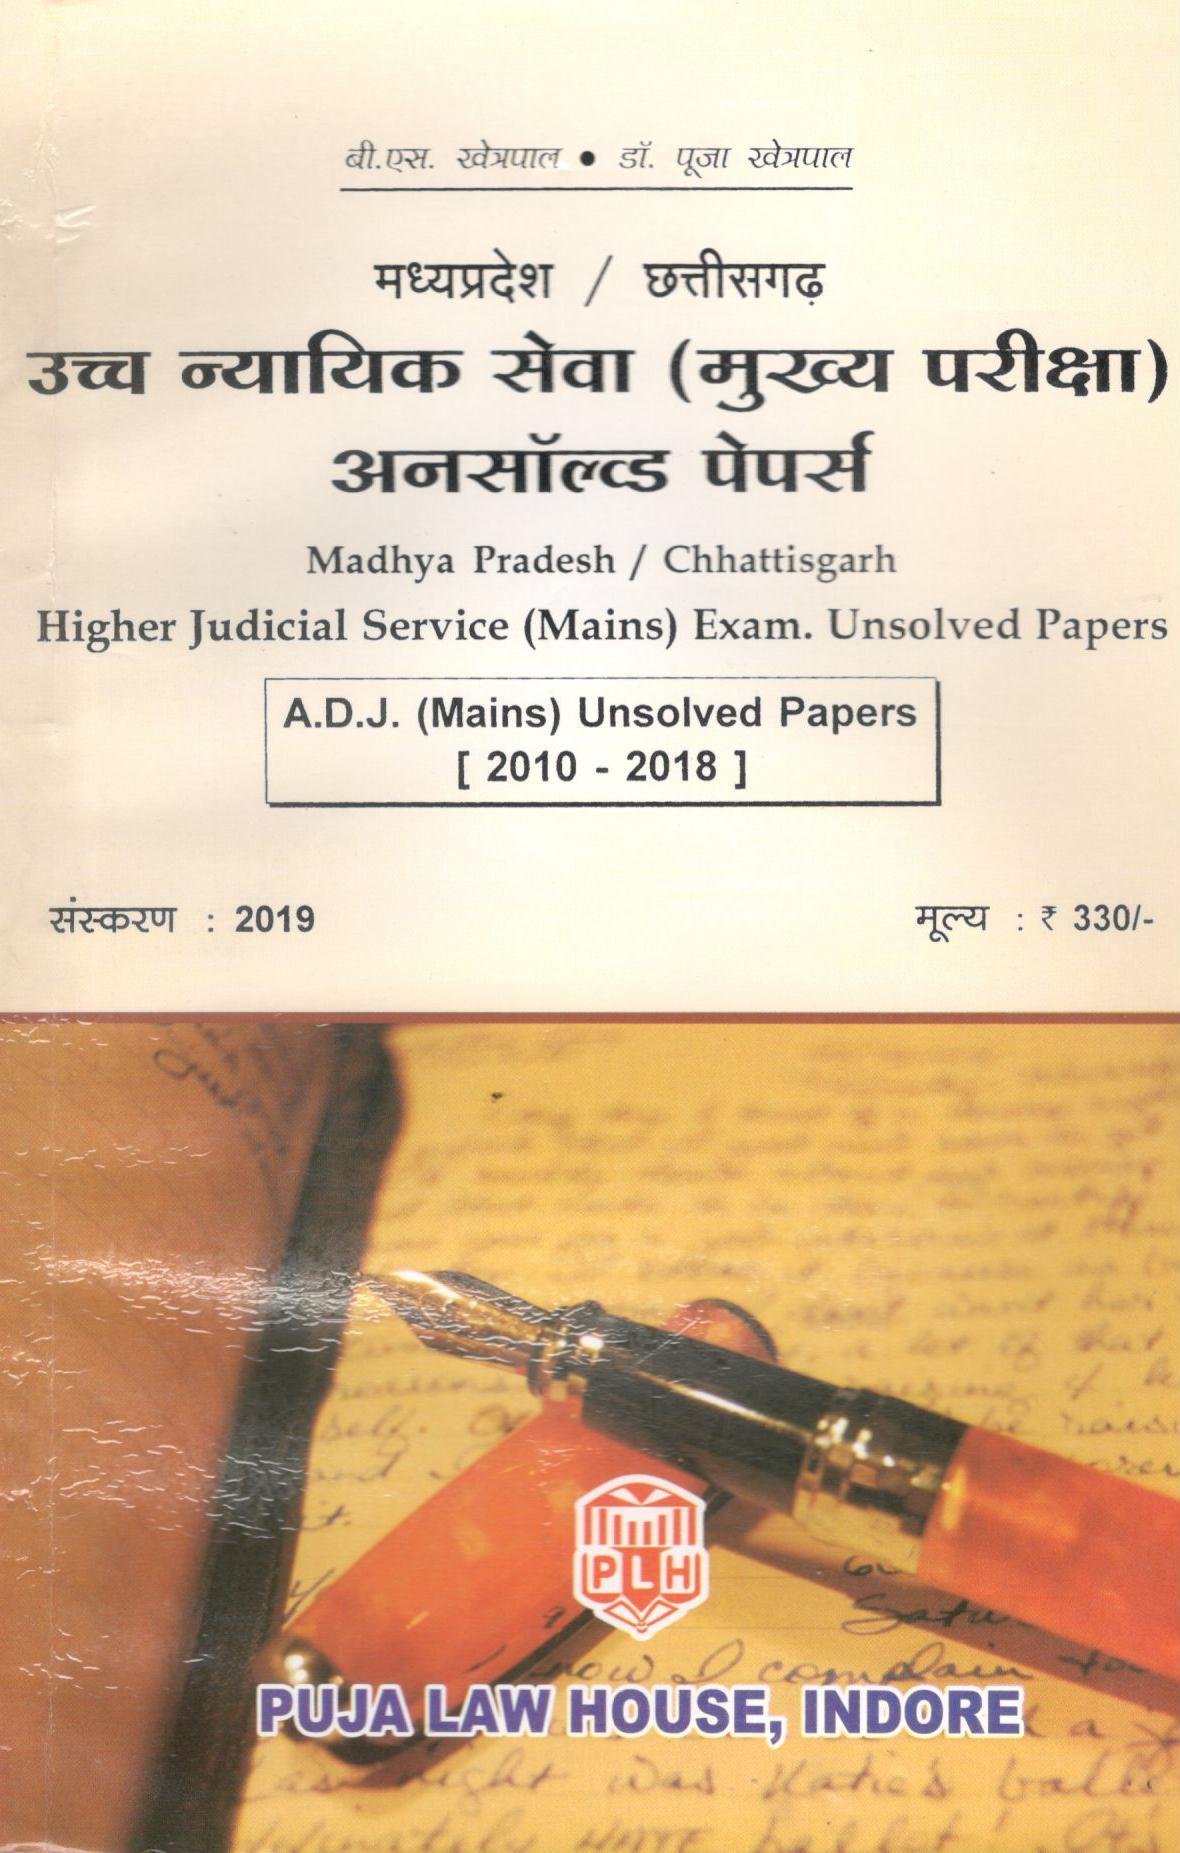 म.प्र./छ.ग. उच्च न्यायिक सेवा (मुख्य परीक्षा) अनसॉल्व्ड पेपर्स / M.P./C.G. A.D.J. (Mains) Unsolved Papers (2010-2018)